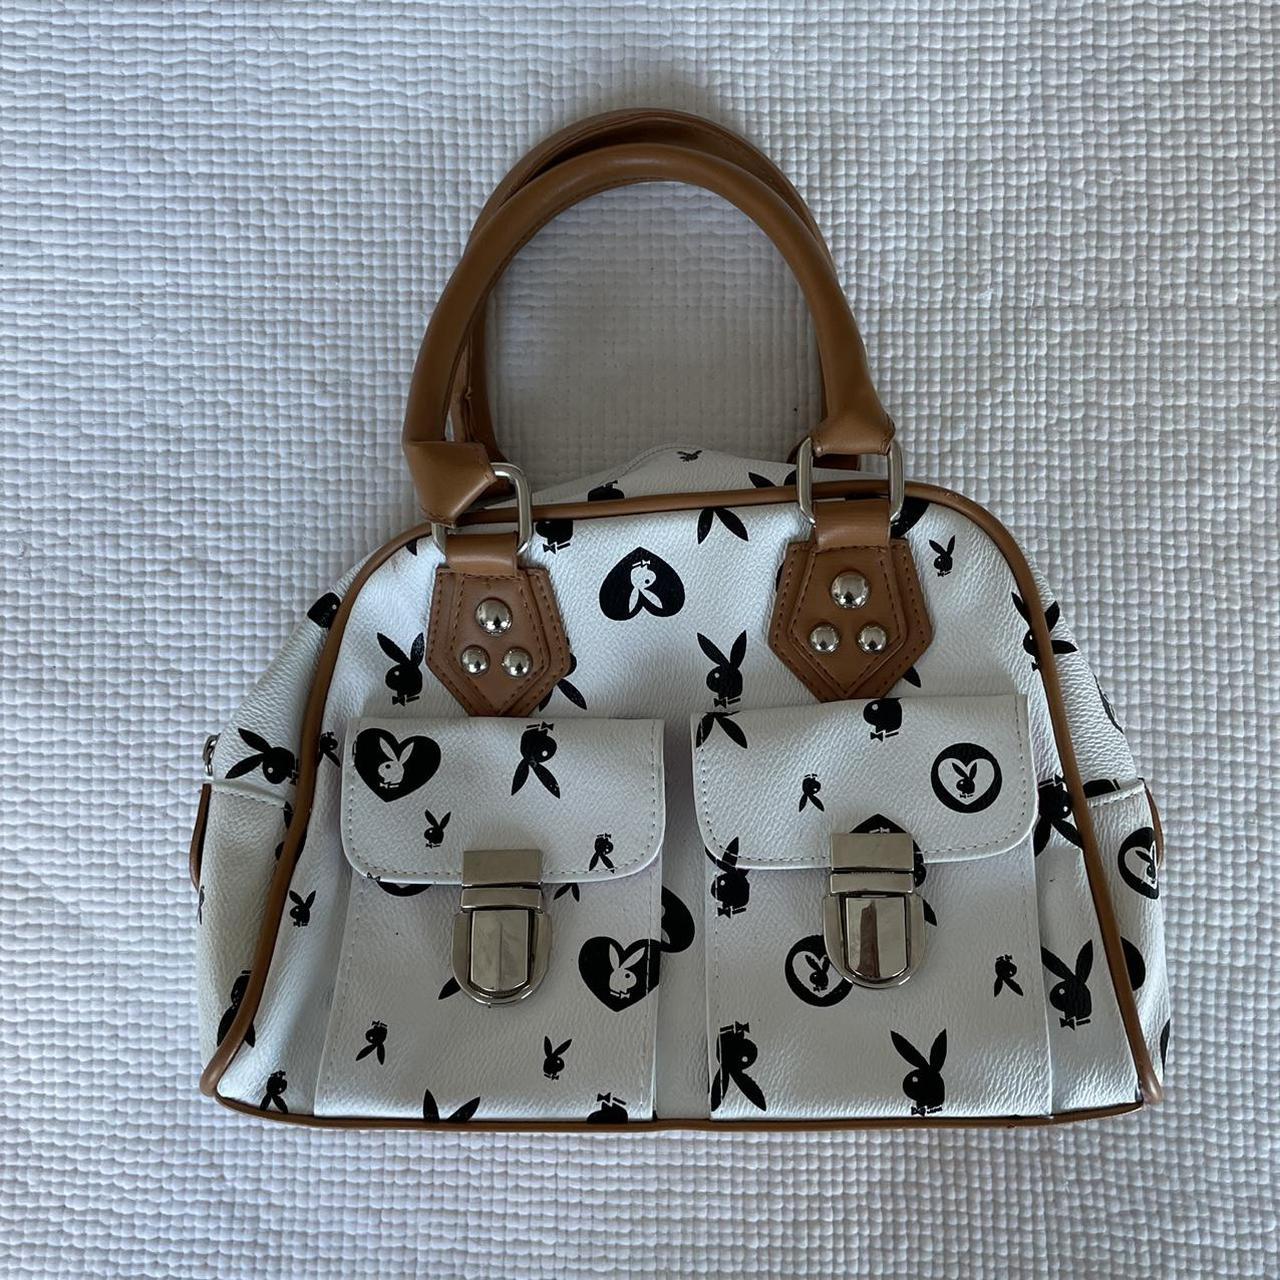 Product Image 1 - Y2K playboy top handle purse